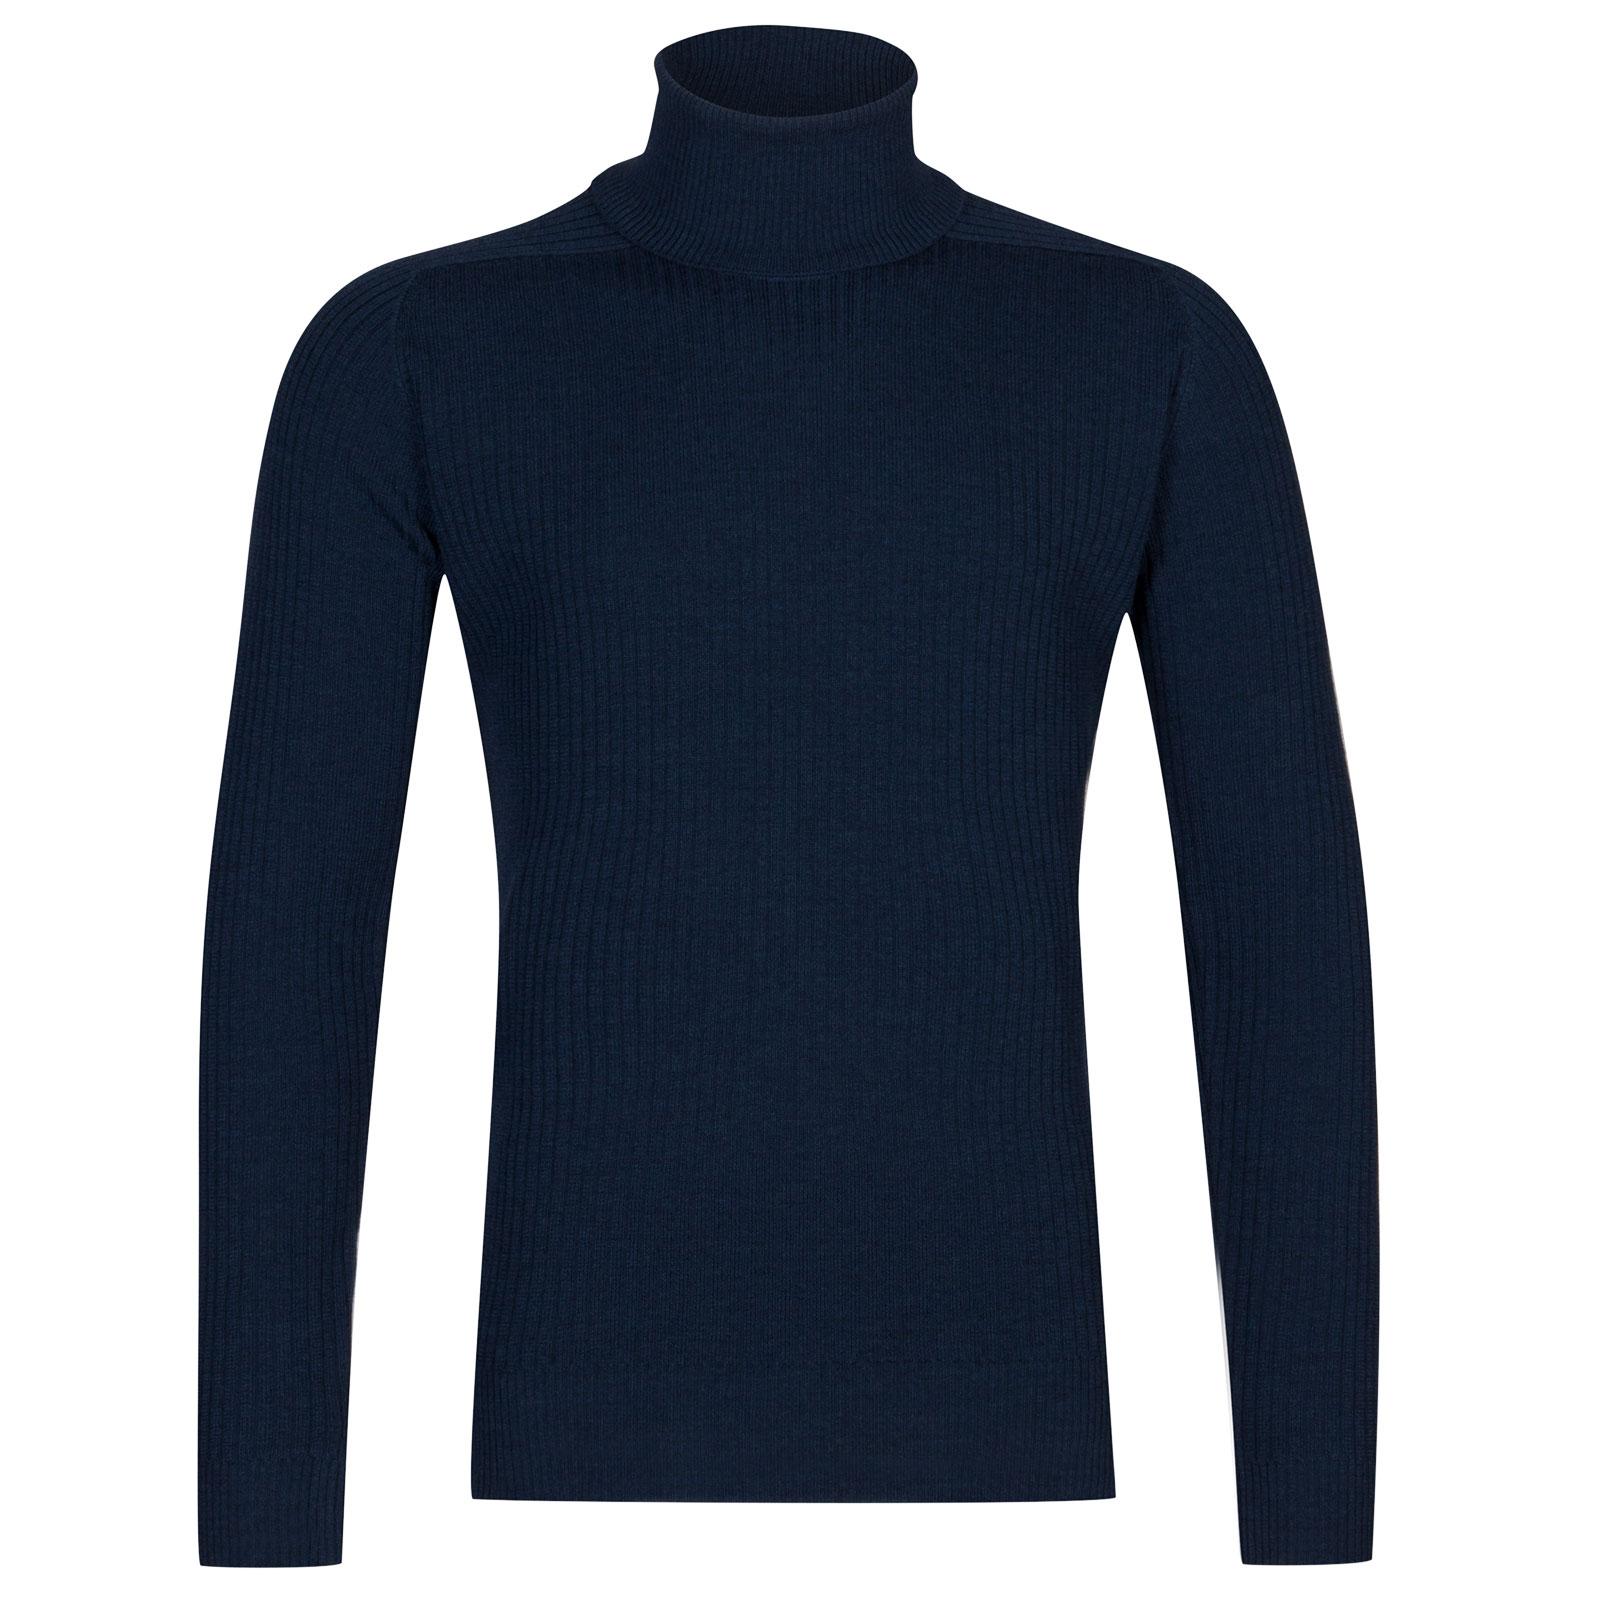 John Smedley redmayne Merino Wool Pullover in Indigo-S